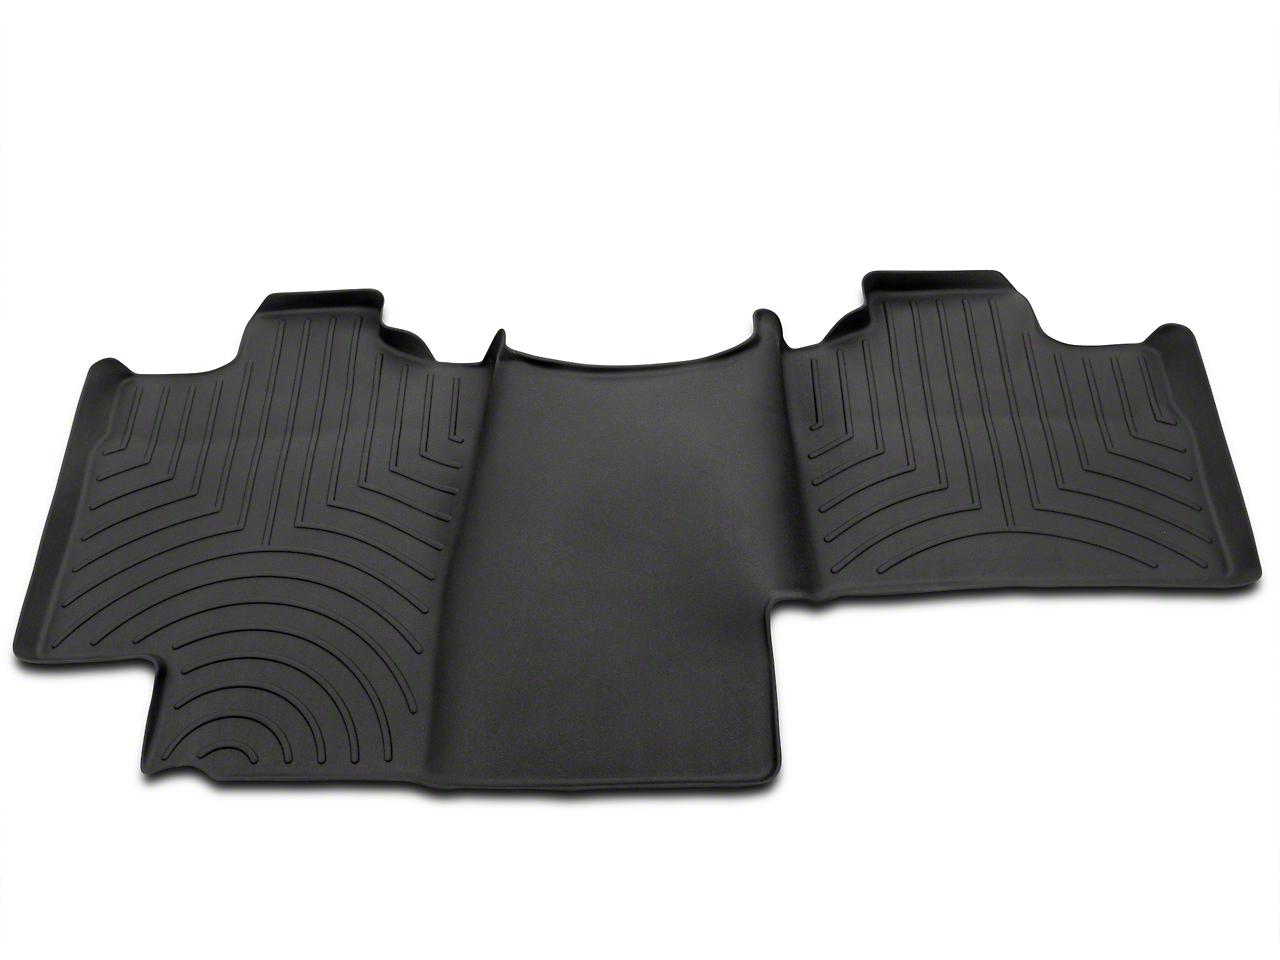 Weathertech DigitalFit Rear Floor Liner - Black (04-08 F-150 SuperCab, SuperCrew)